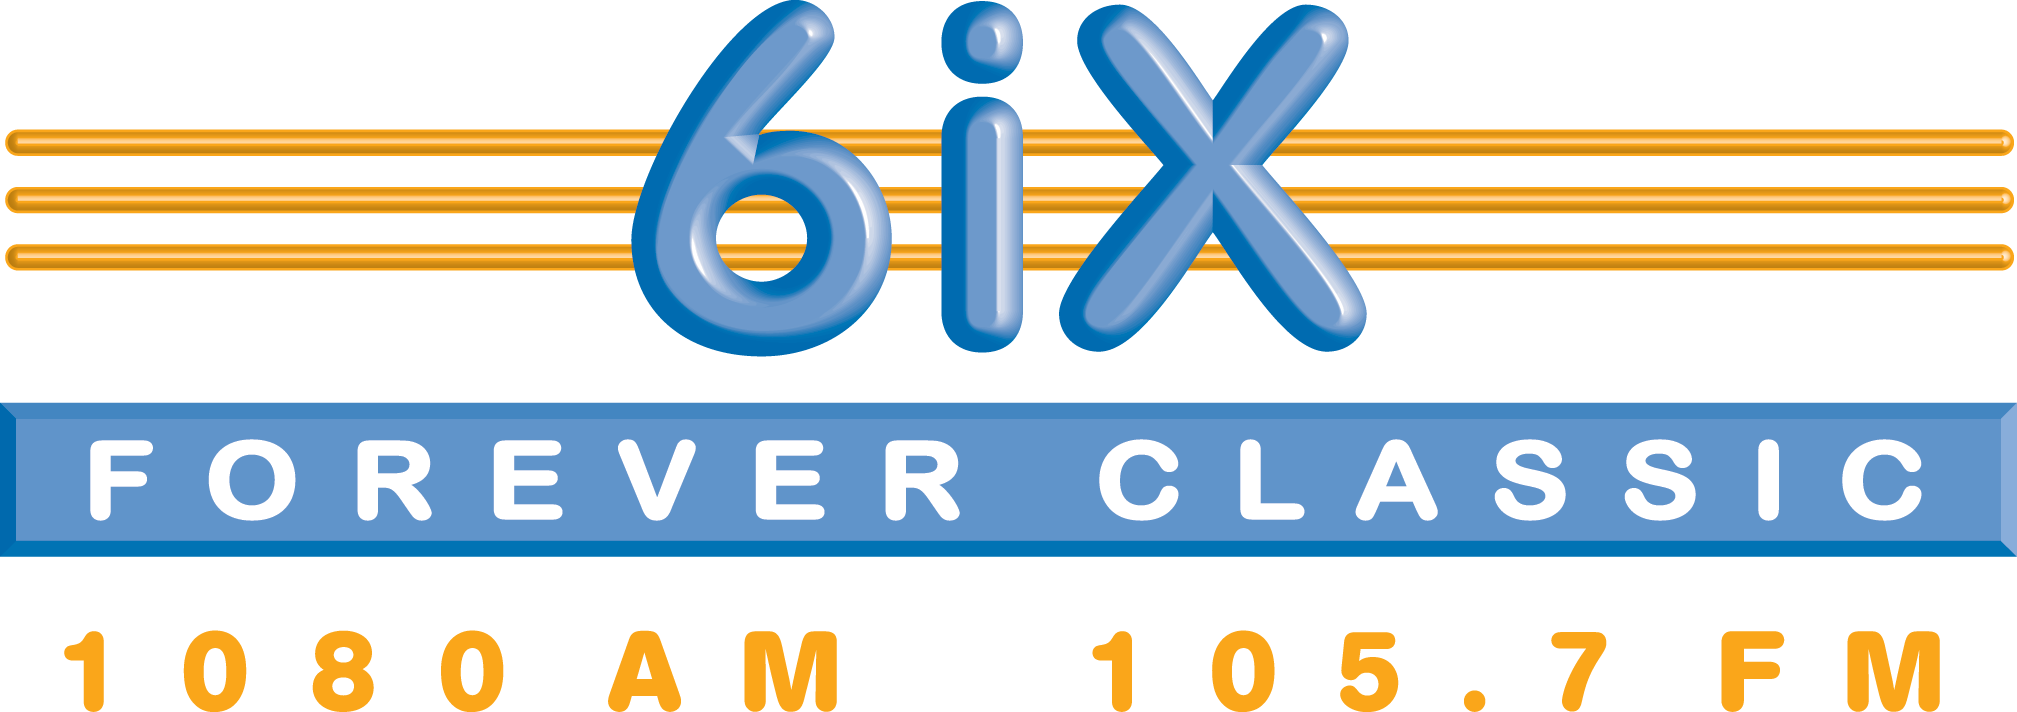 6iX logo.png